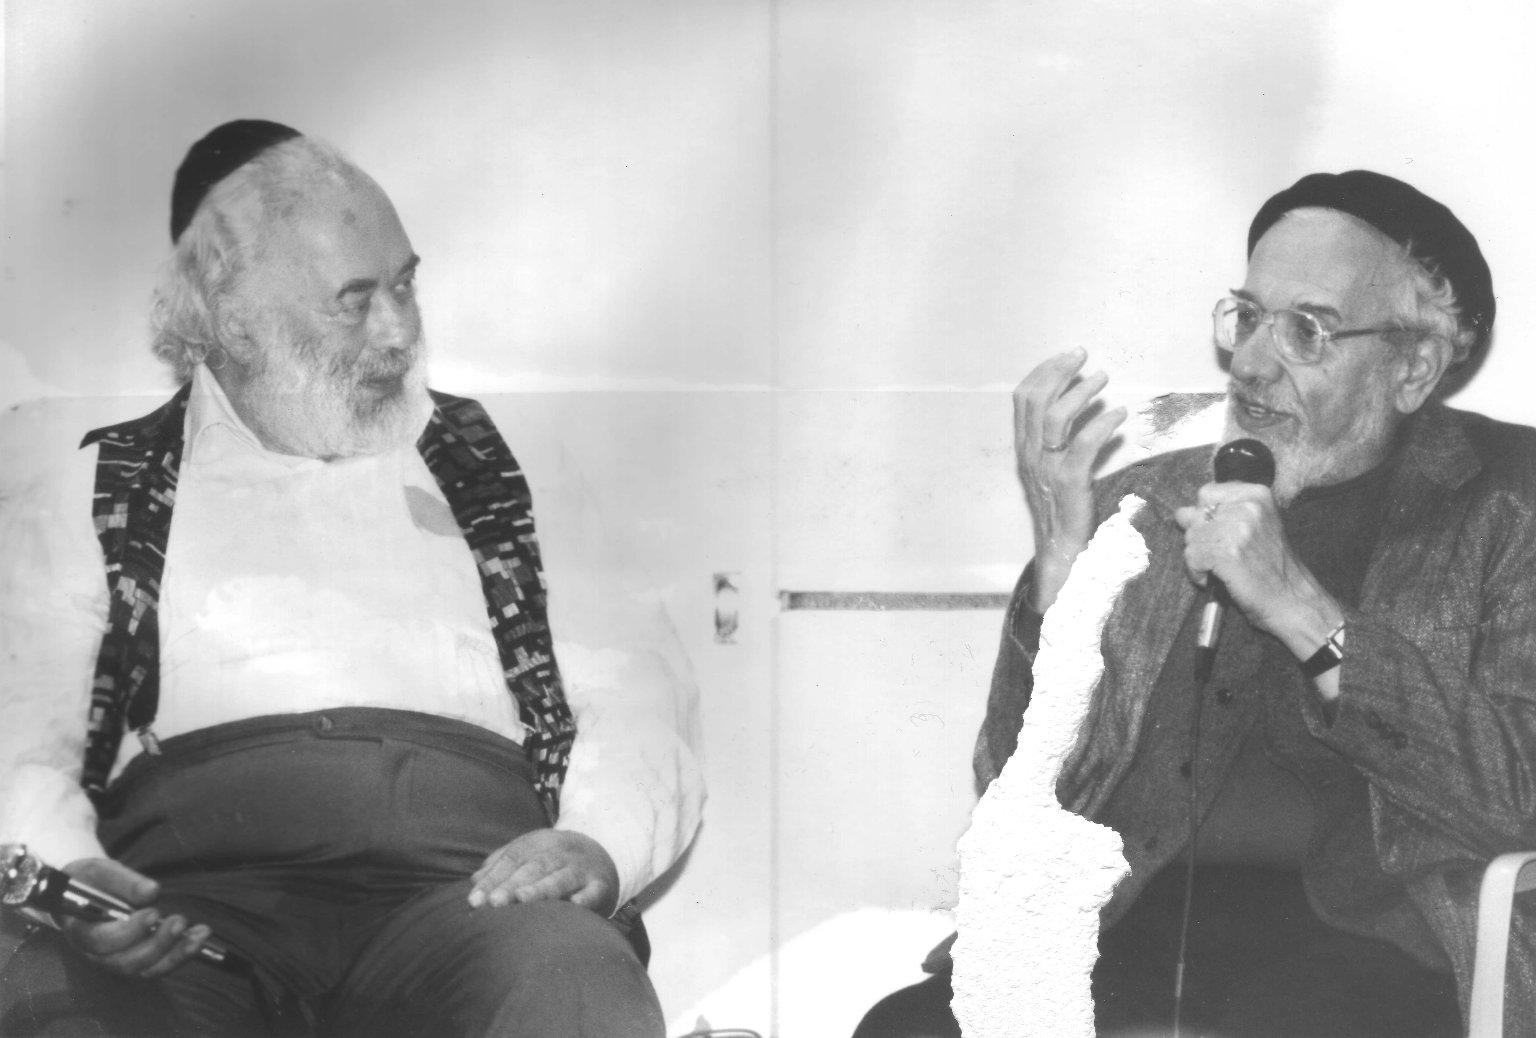 Rabbi Shlomo Carlebach and Rabbi Zalman Schachter-Shalomi speaking in Berkeley, California, in March of 1994.